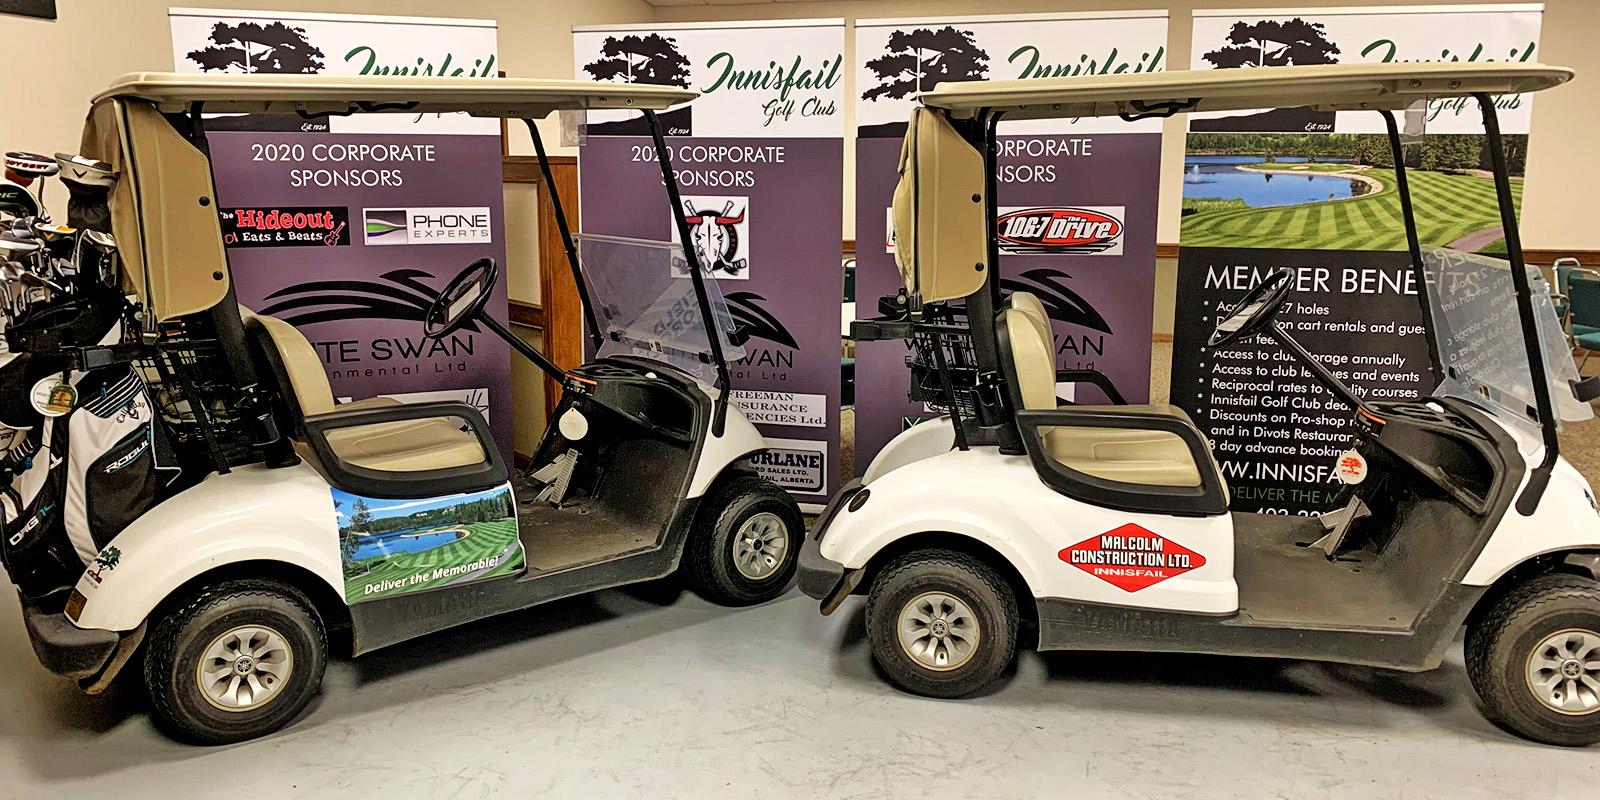 Premium Power Cart Decaling - Corporate Advertising - Innisfail Golf Club